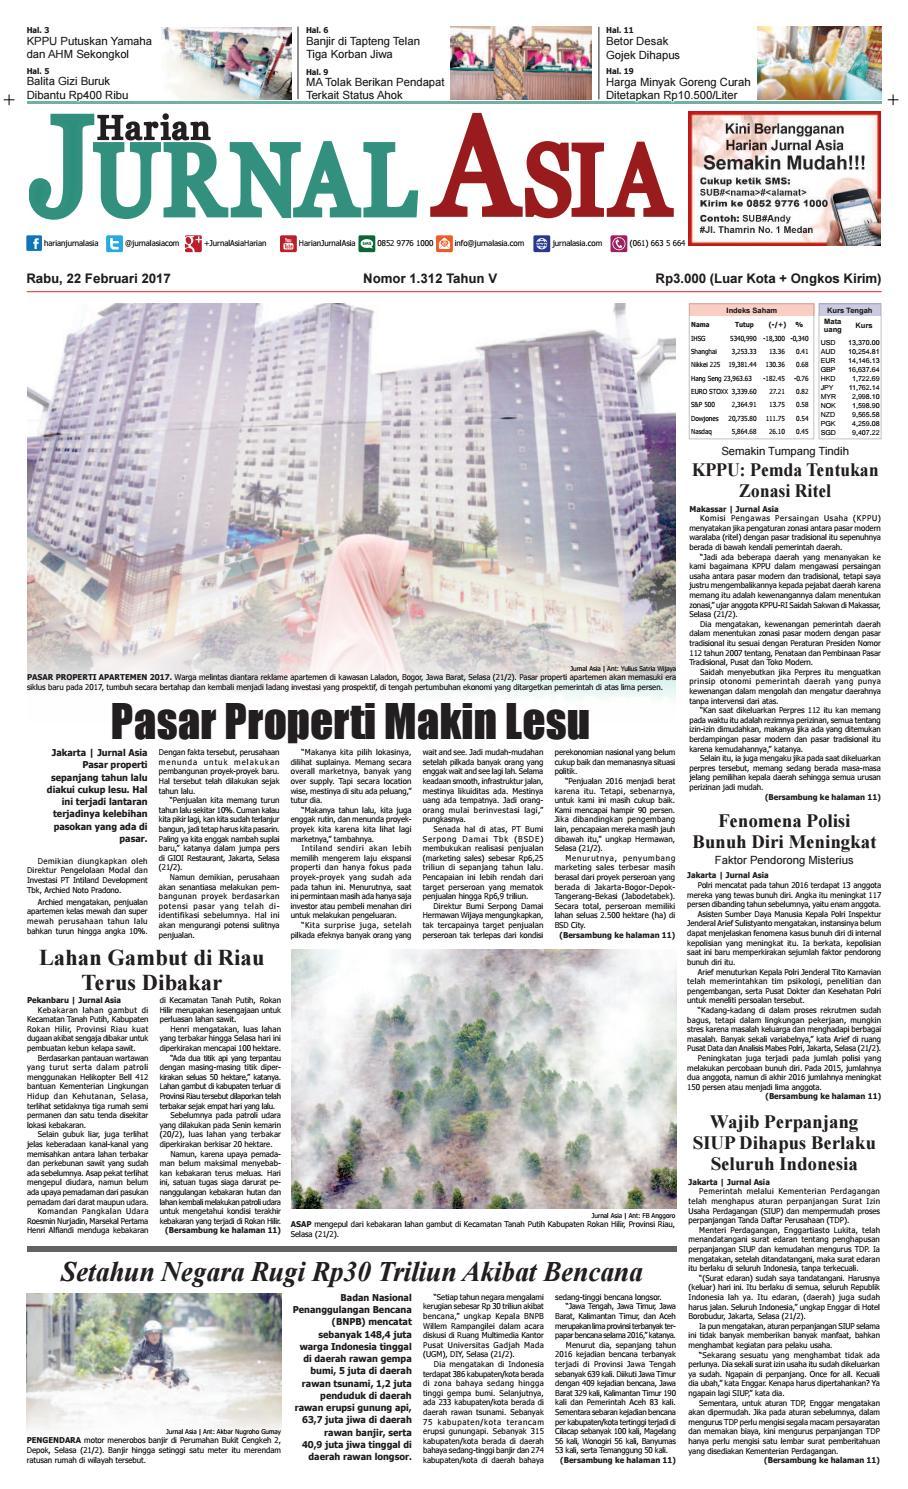 Harian Jurnal Asia Edisi Rabu 22 Februari 2017 By Harian